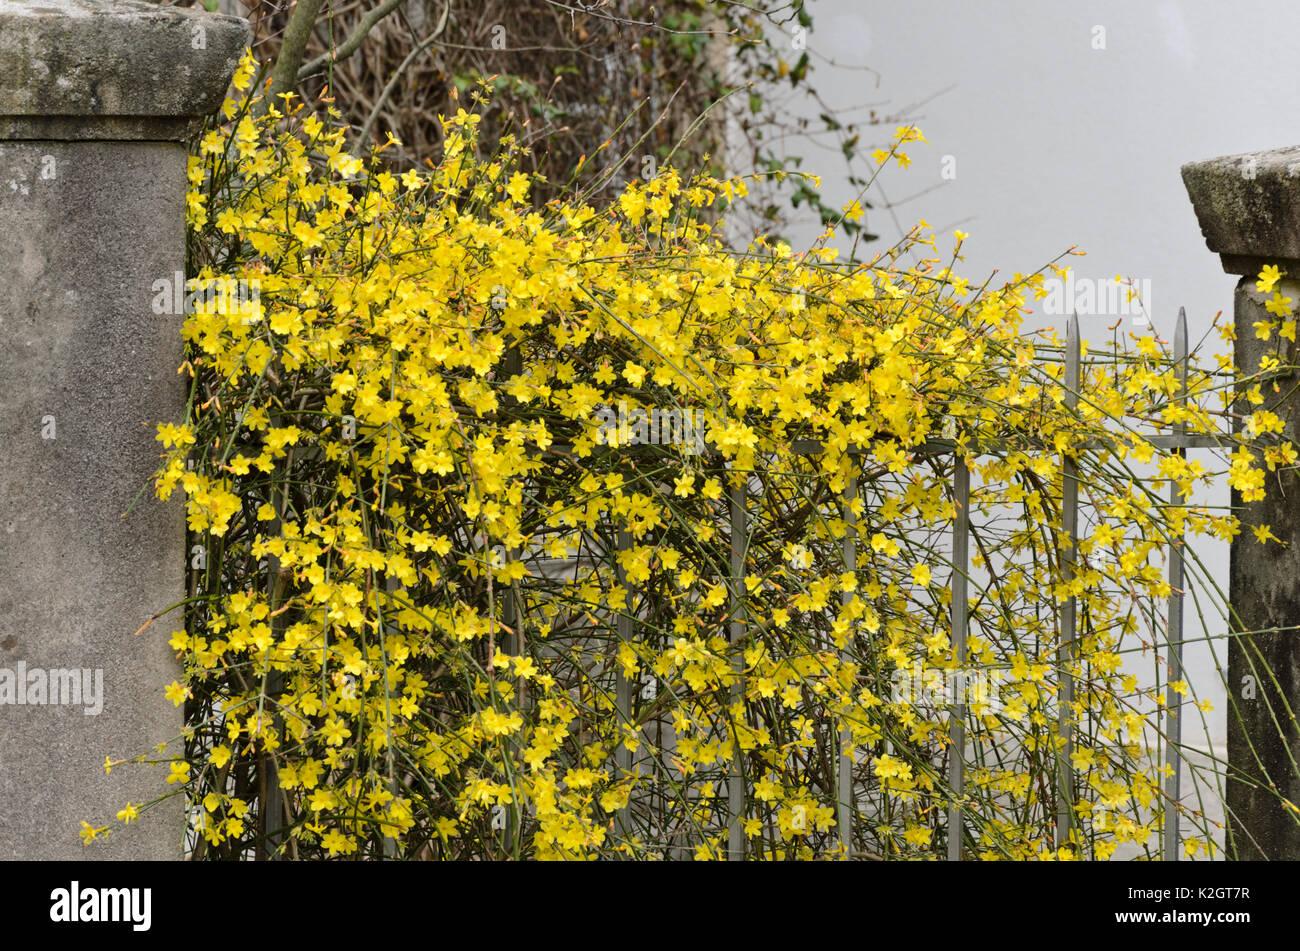 flowers of jasminum nudiflorum stock photos flowers of jasminum nudiflorum stock images alamy. Black Bedroom Furniture Sets. Home Design Ideas